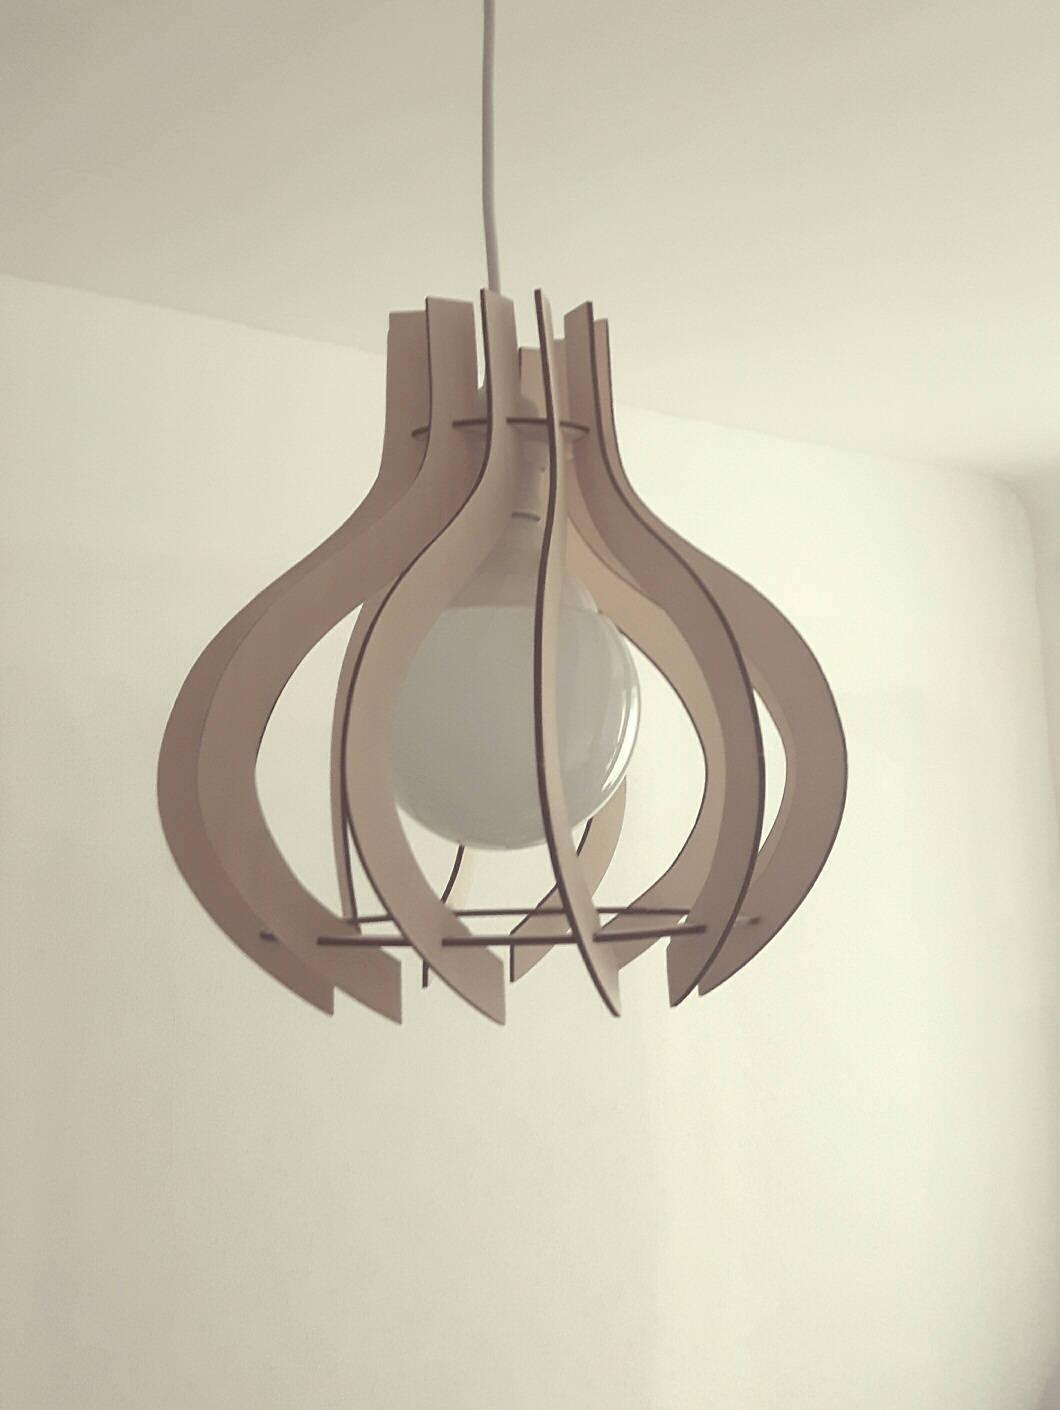 plywood lighting. Plywood Lamp Shade ALLIUM, Laser Cut, Natural, Original Design Hanging Wooden Pendant Lighting